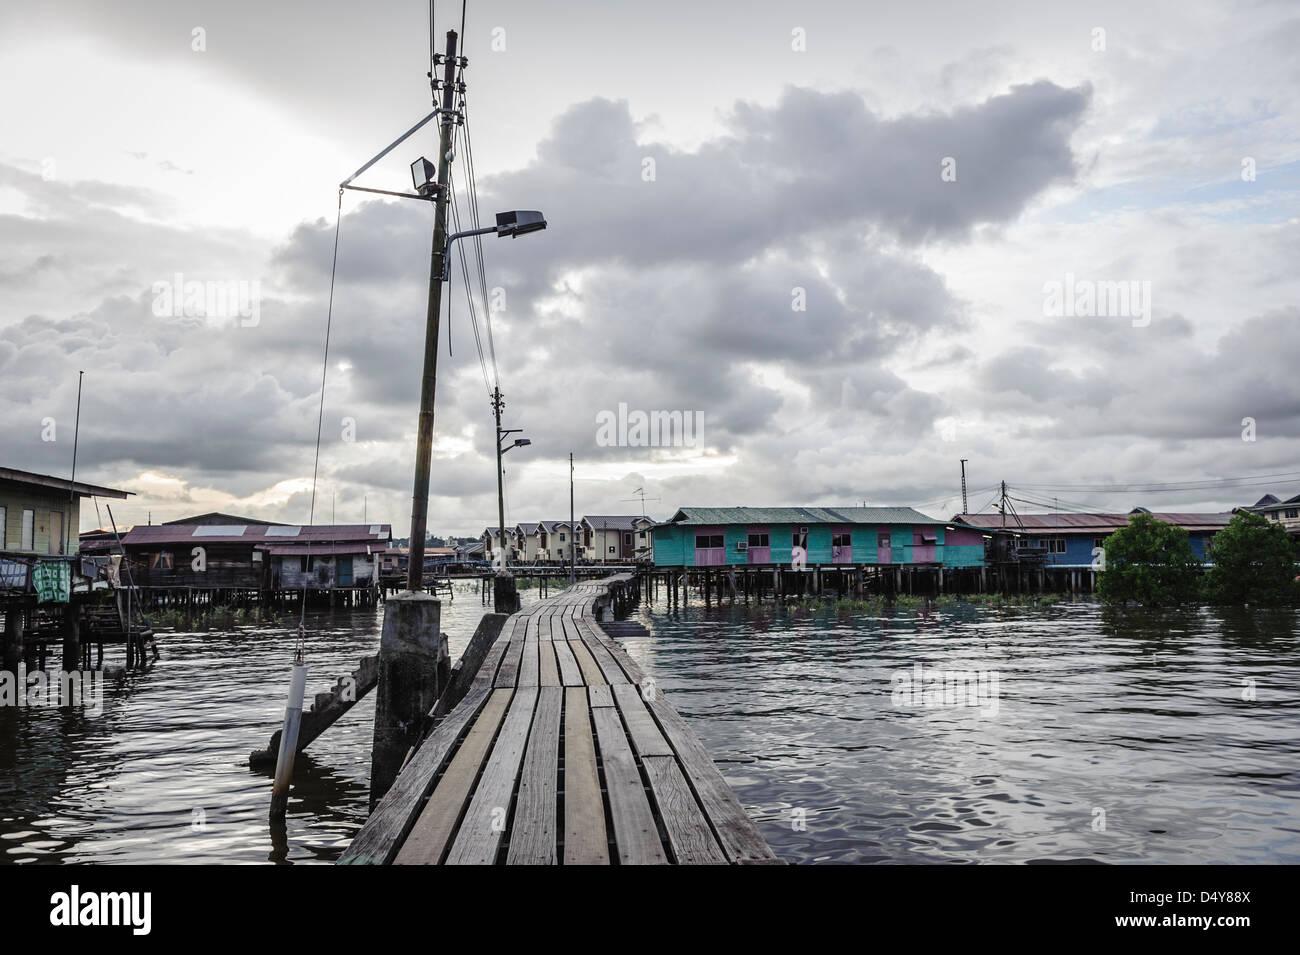 Floating streets of Kampung Ayer neighbourhood, Bandar Seri Bengawan, Brunei, Asia - Stock Image